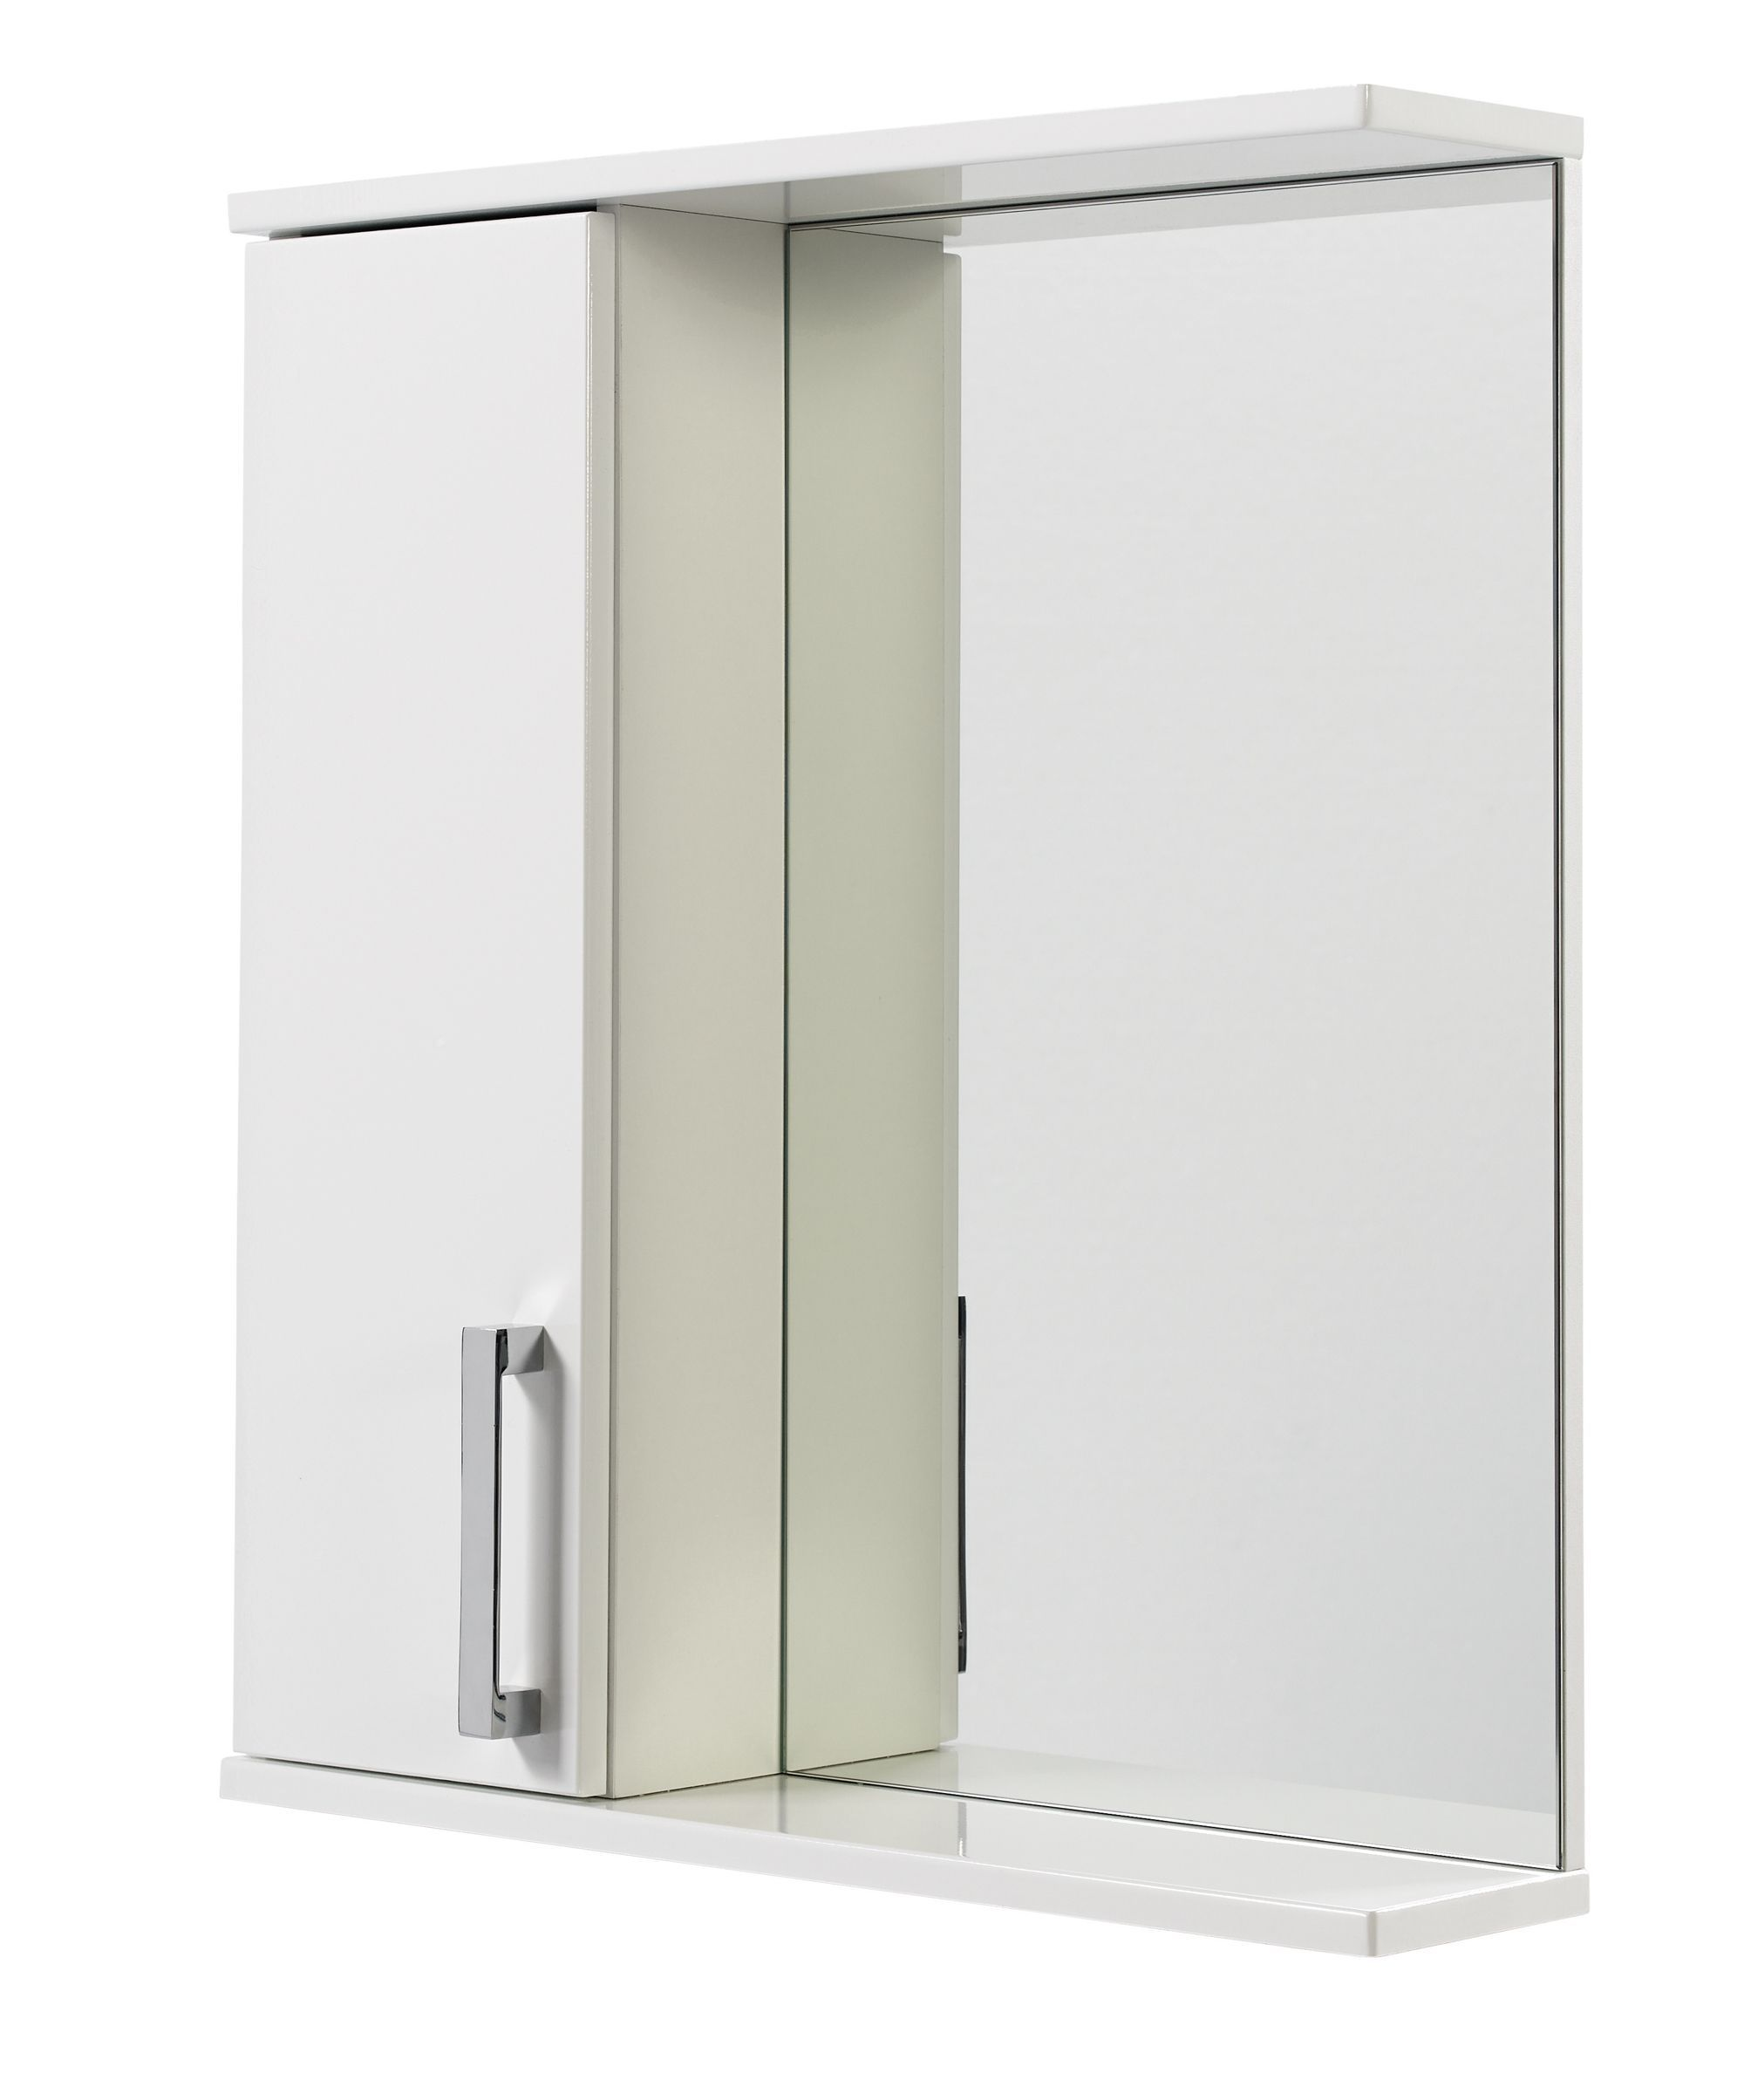 Ardenno Single Door White Gloss Mirror Cabinet